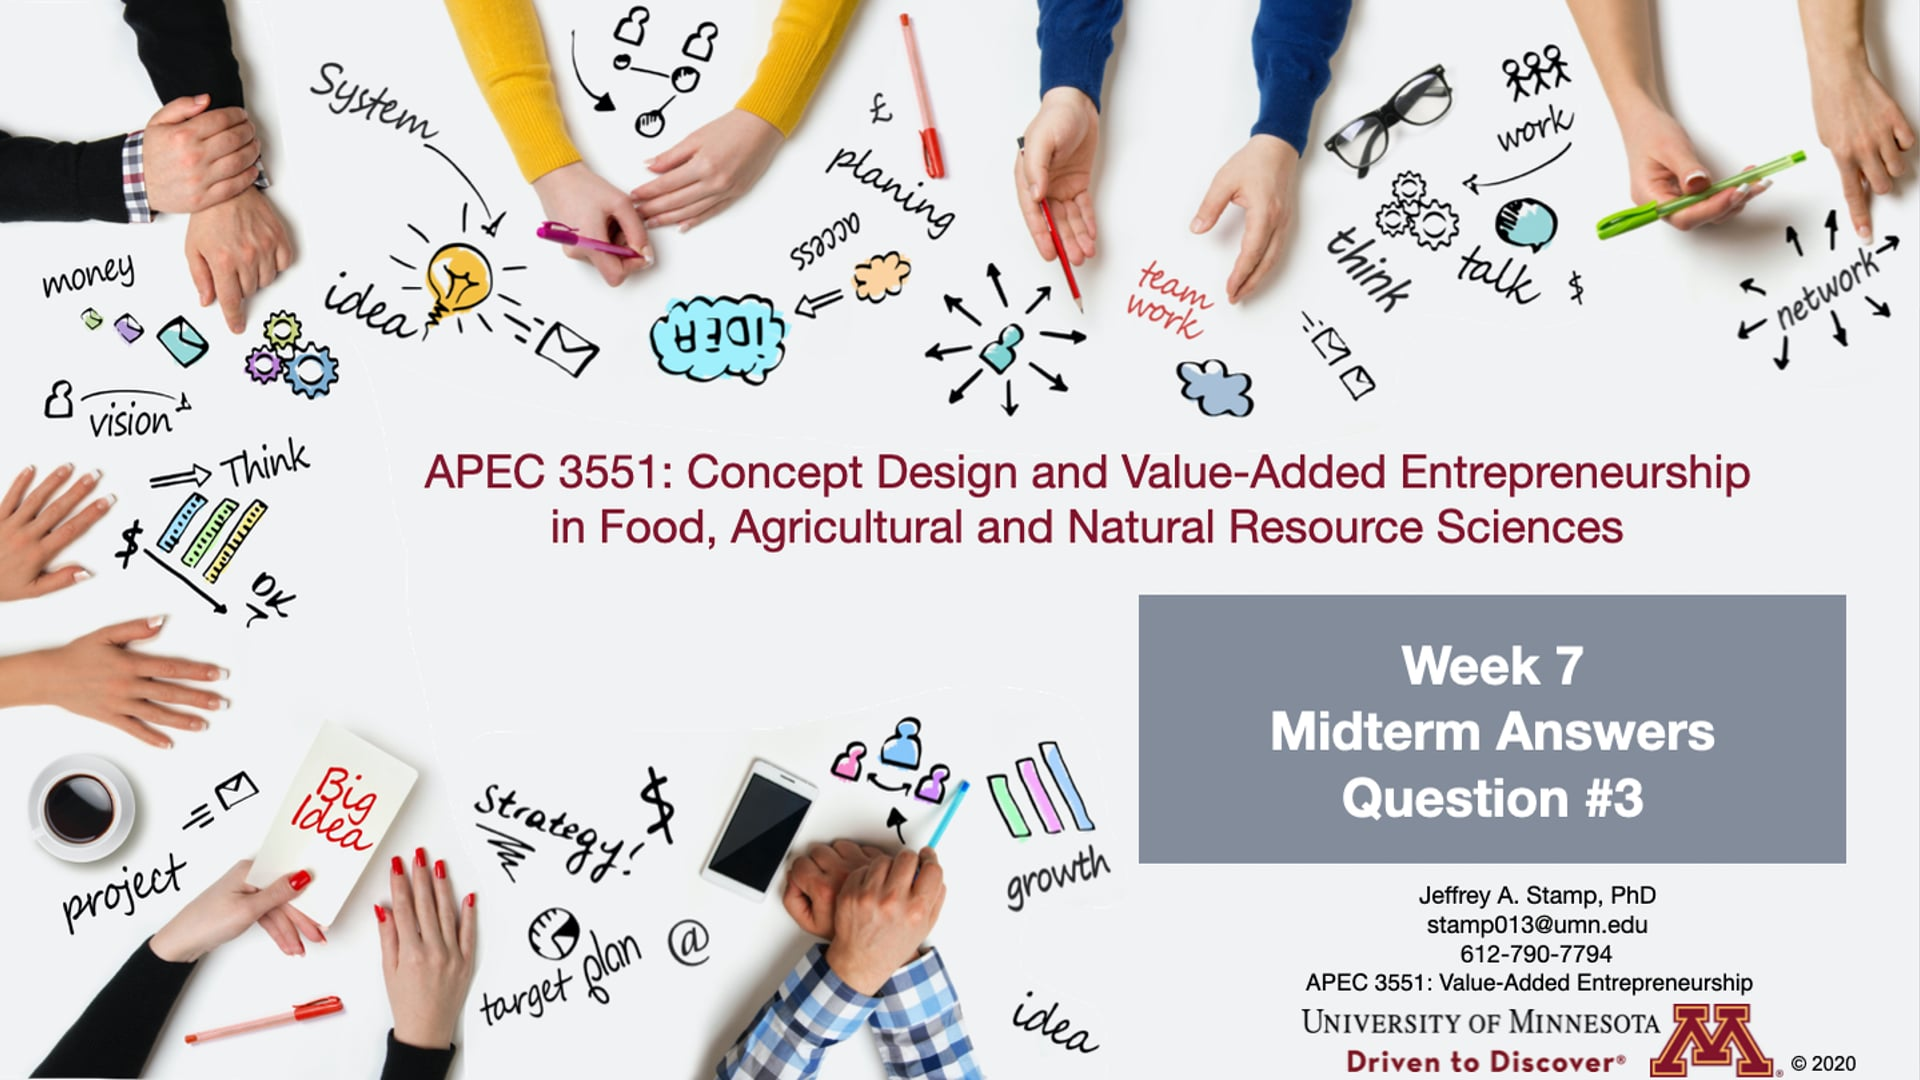 APEC 3551 F20 Midterm Answers Question #3